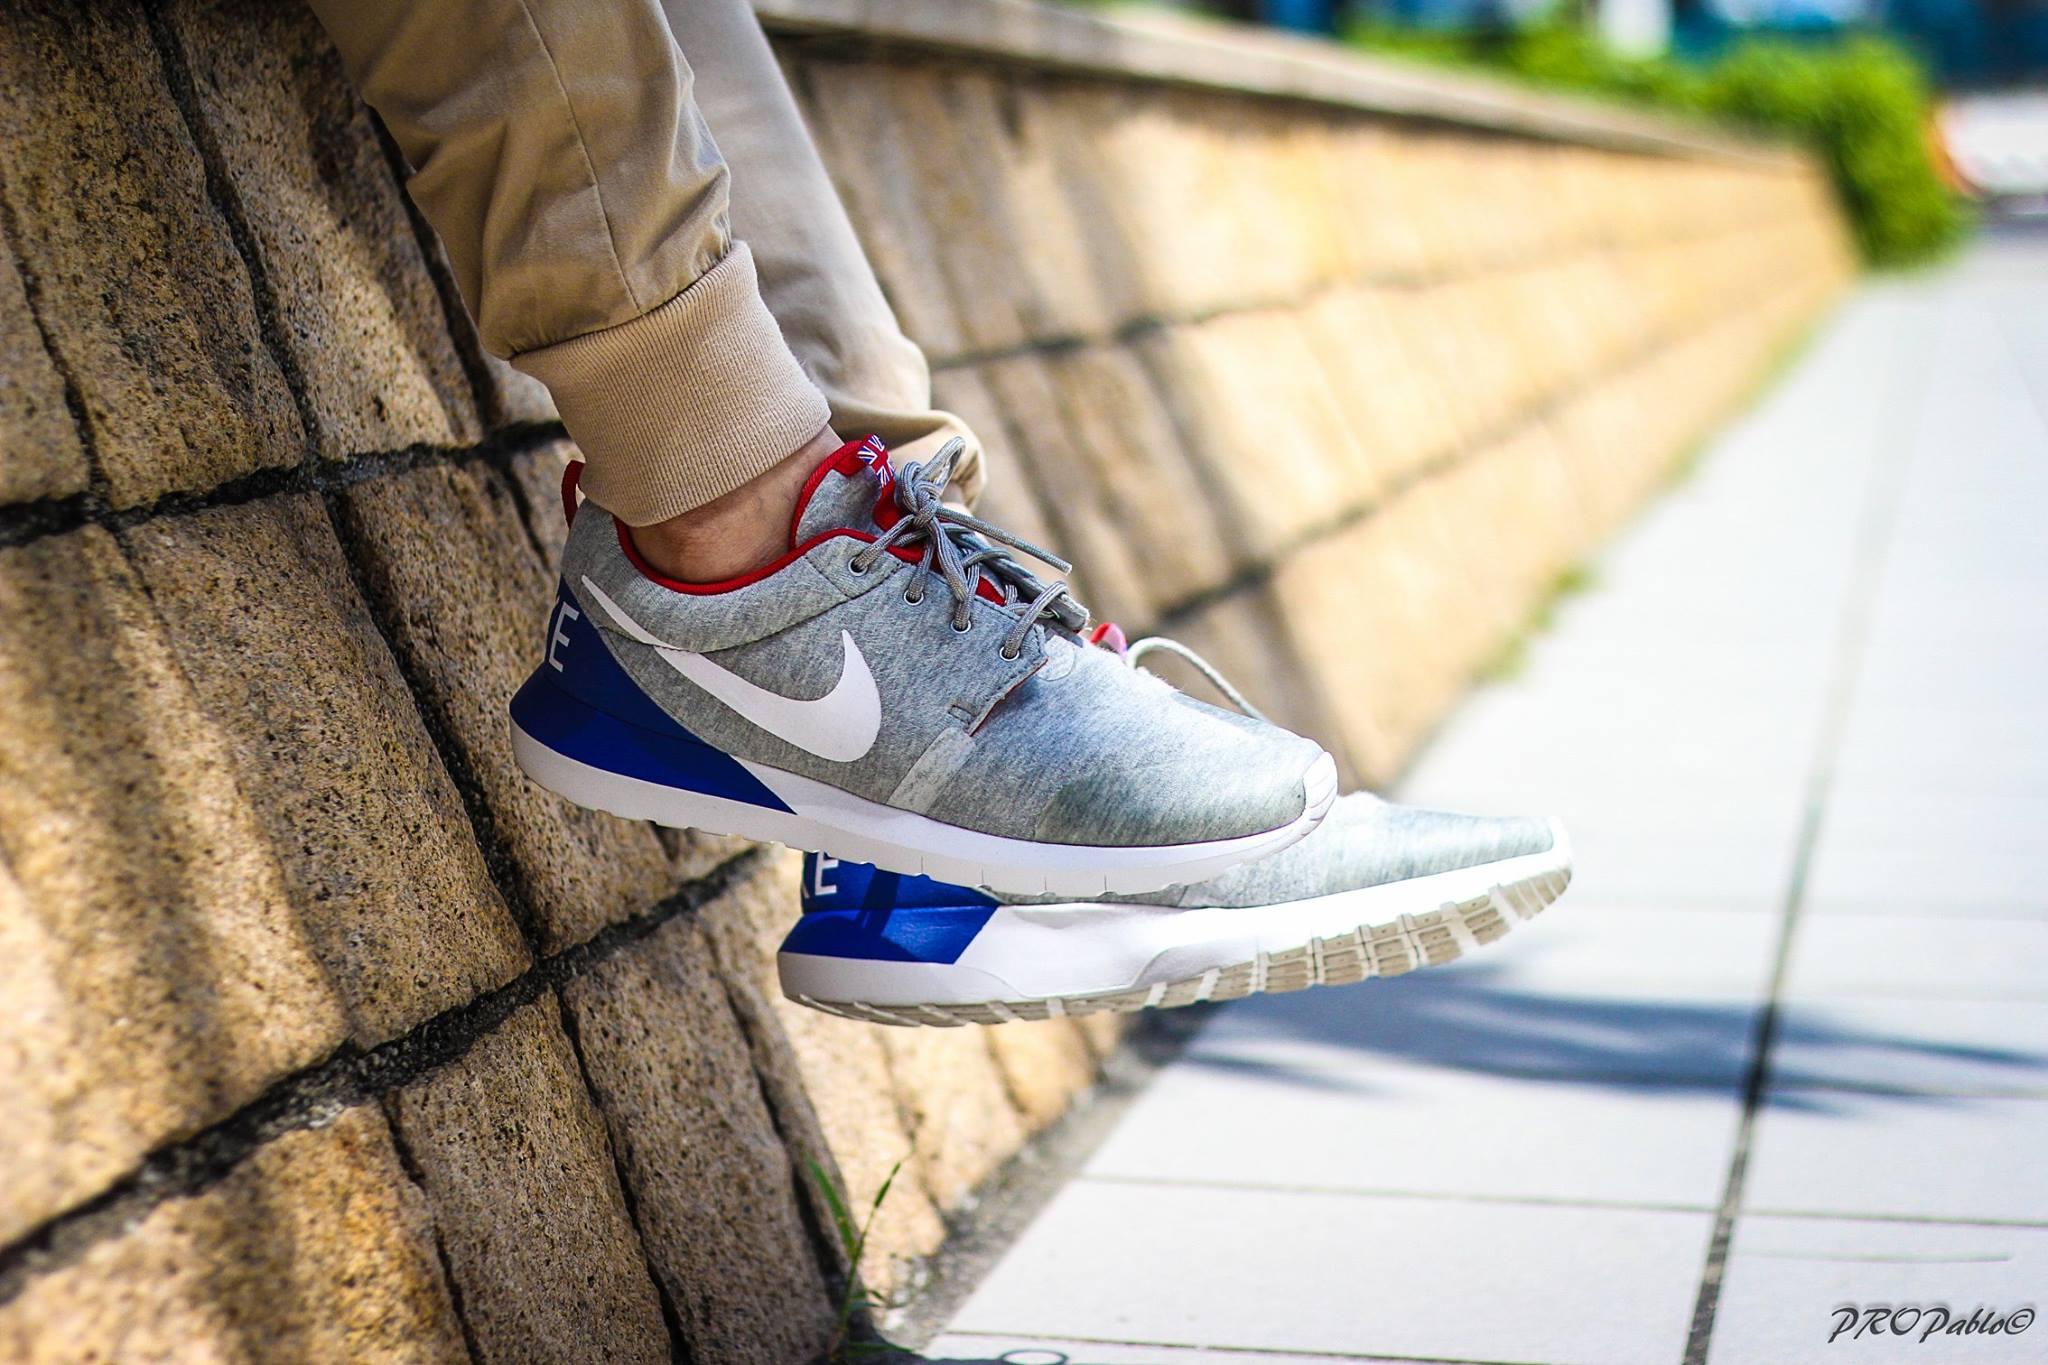 Randell Pablo -  Nike Roshe Run NM 'Great Britain'